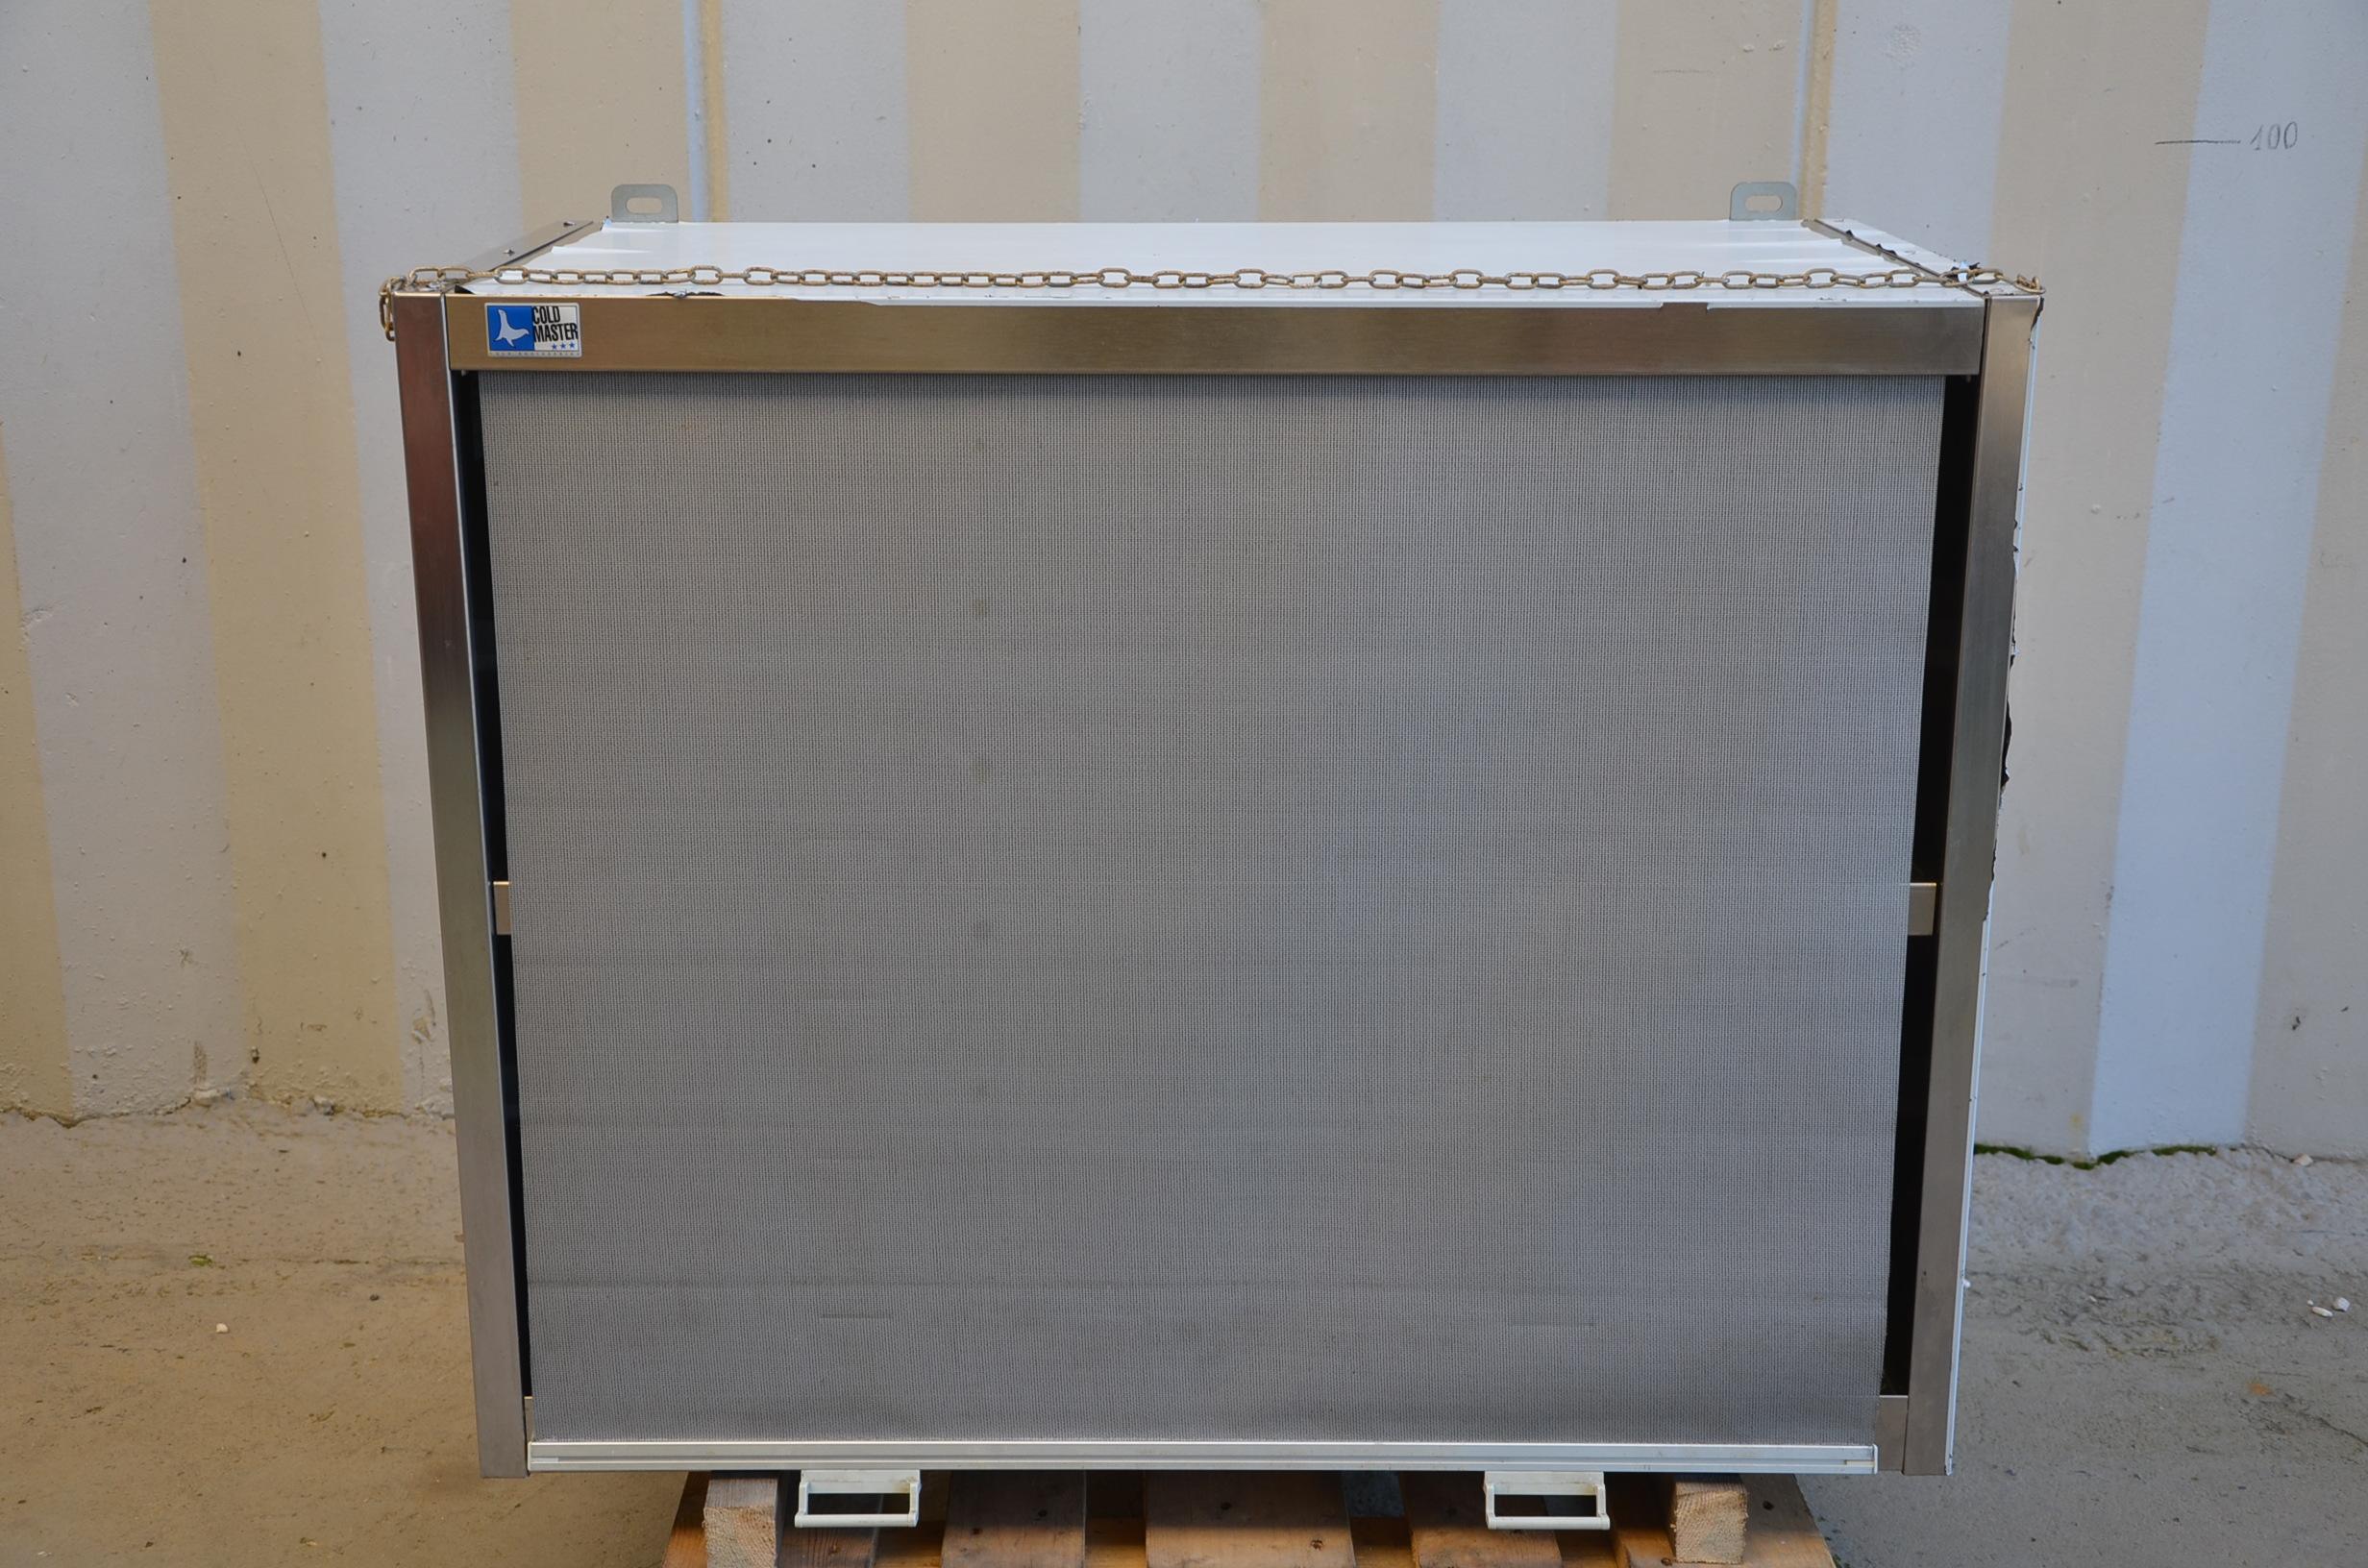 Pensile refrigerato senza gruppo frigo - Tecfrigo in vendita - foto 2